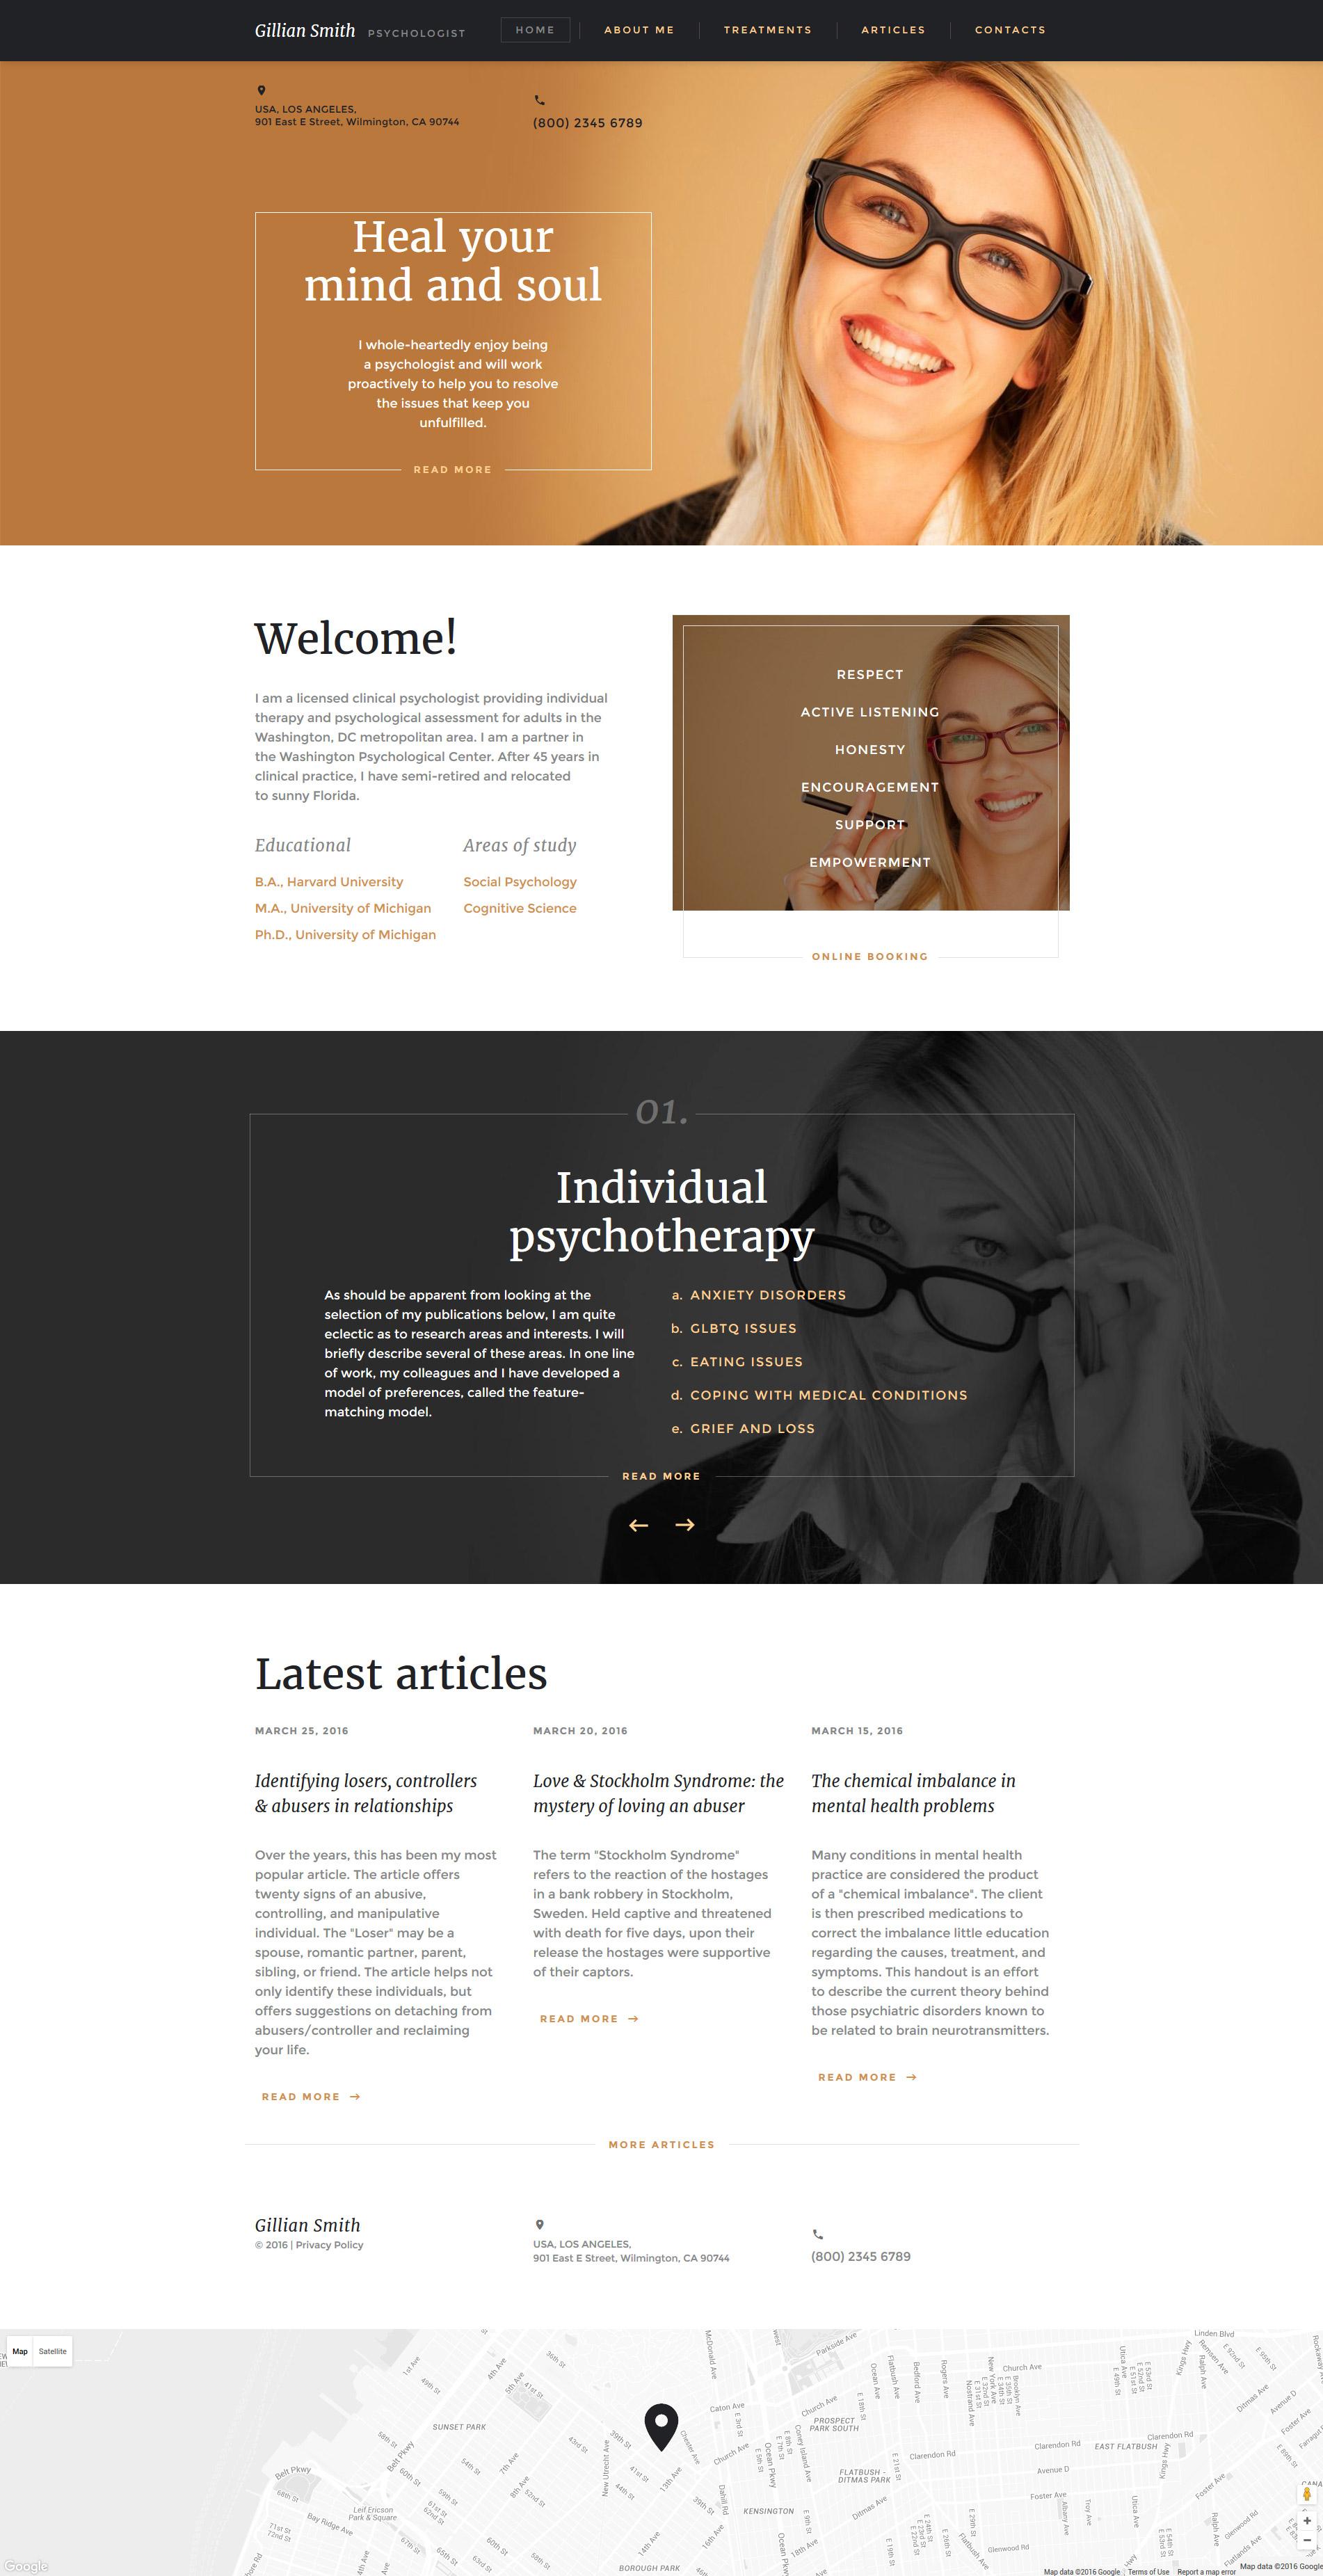 Psychologist для сайта психолога №58529 - скриншот